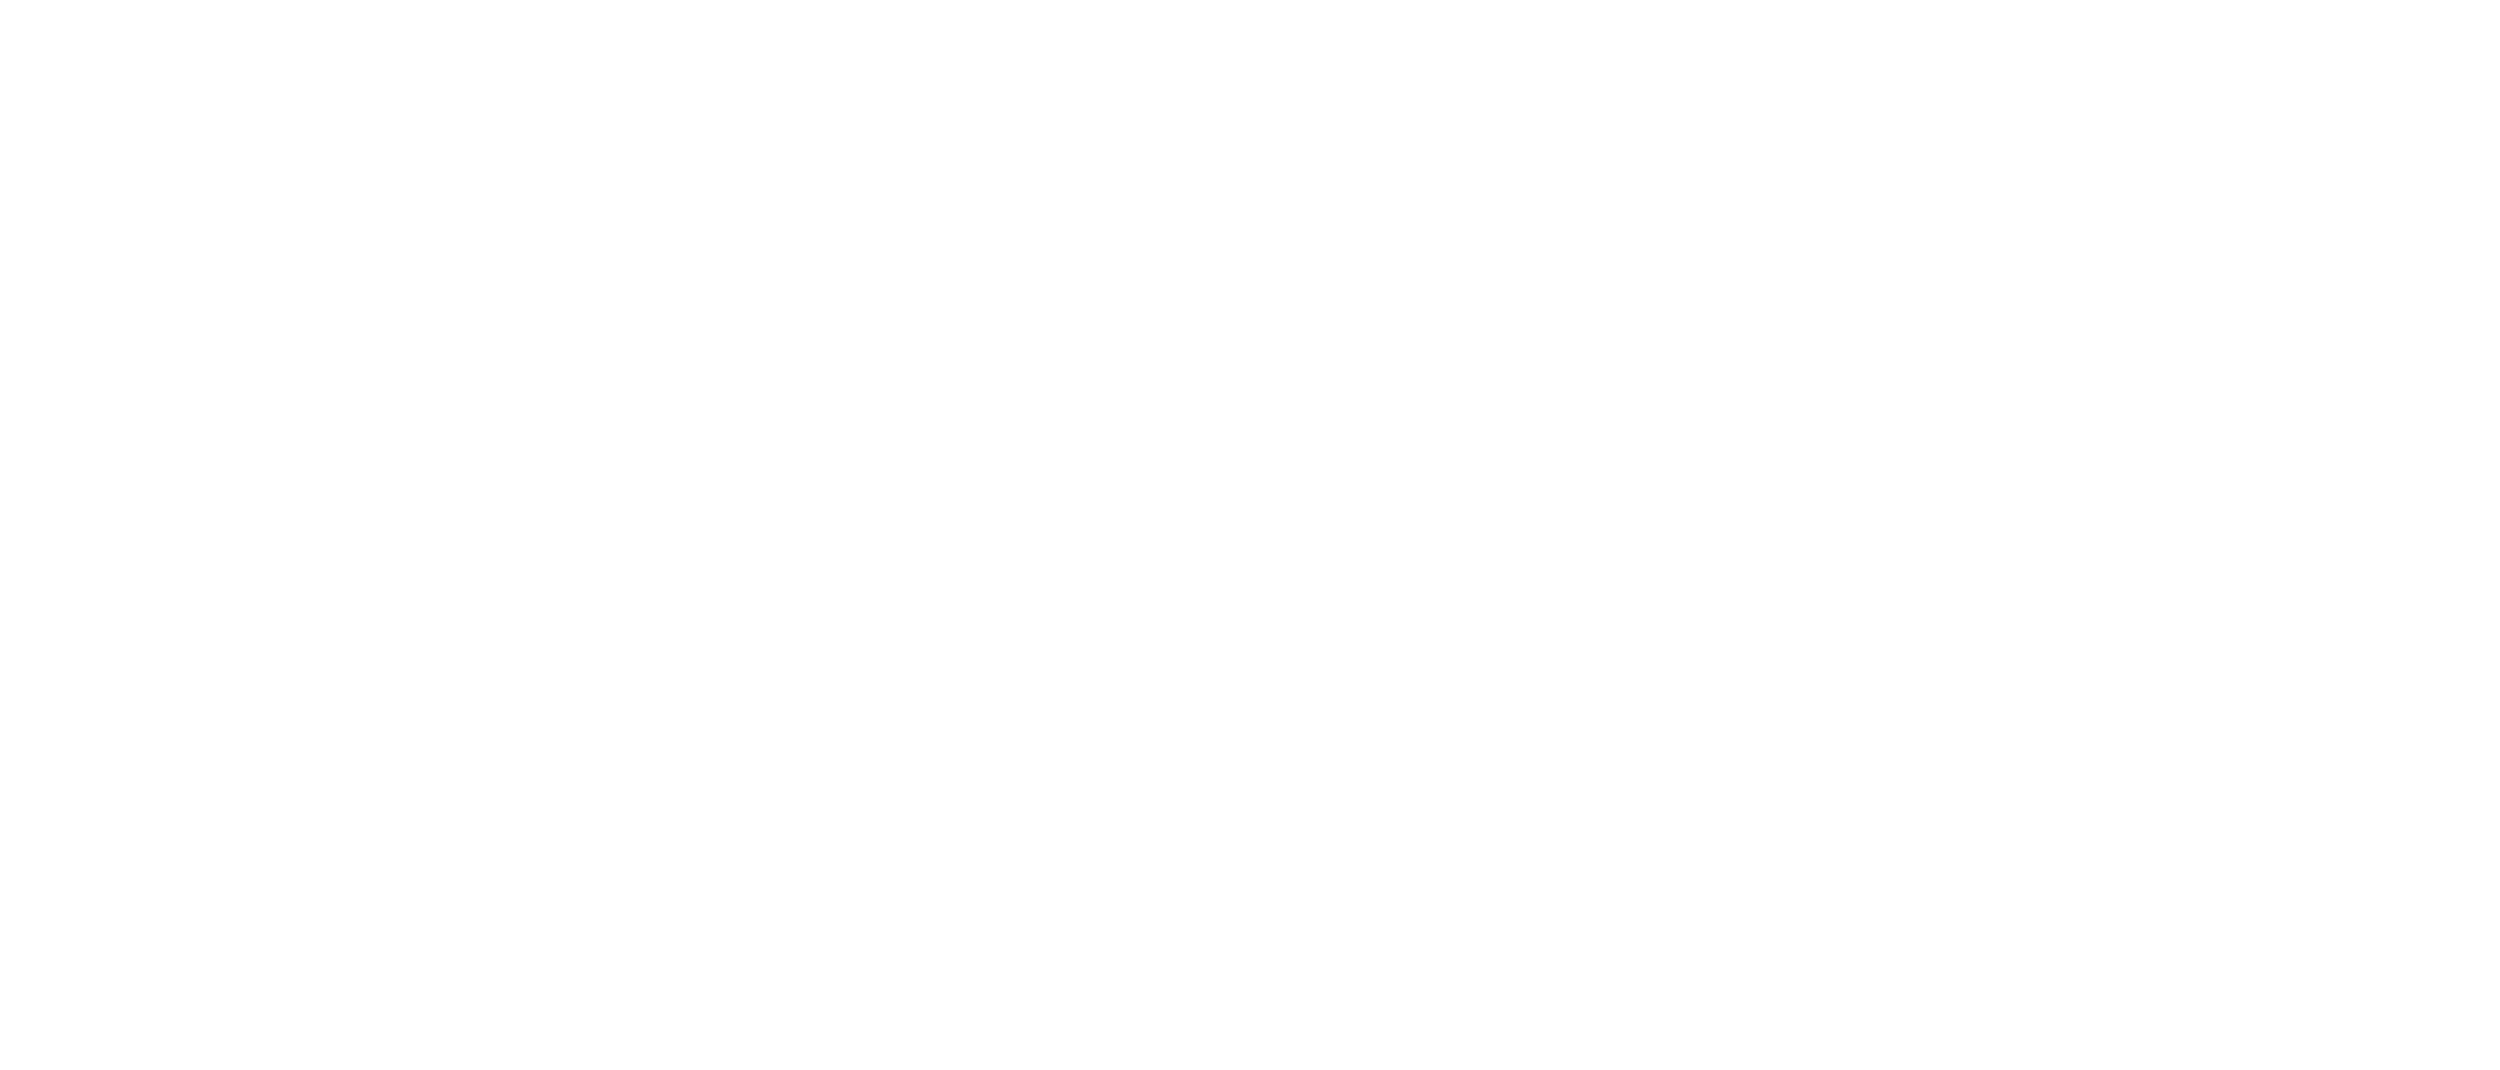 rhythm-model-02.4_tive-2.4.2-viz